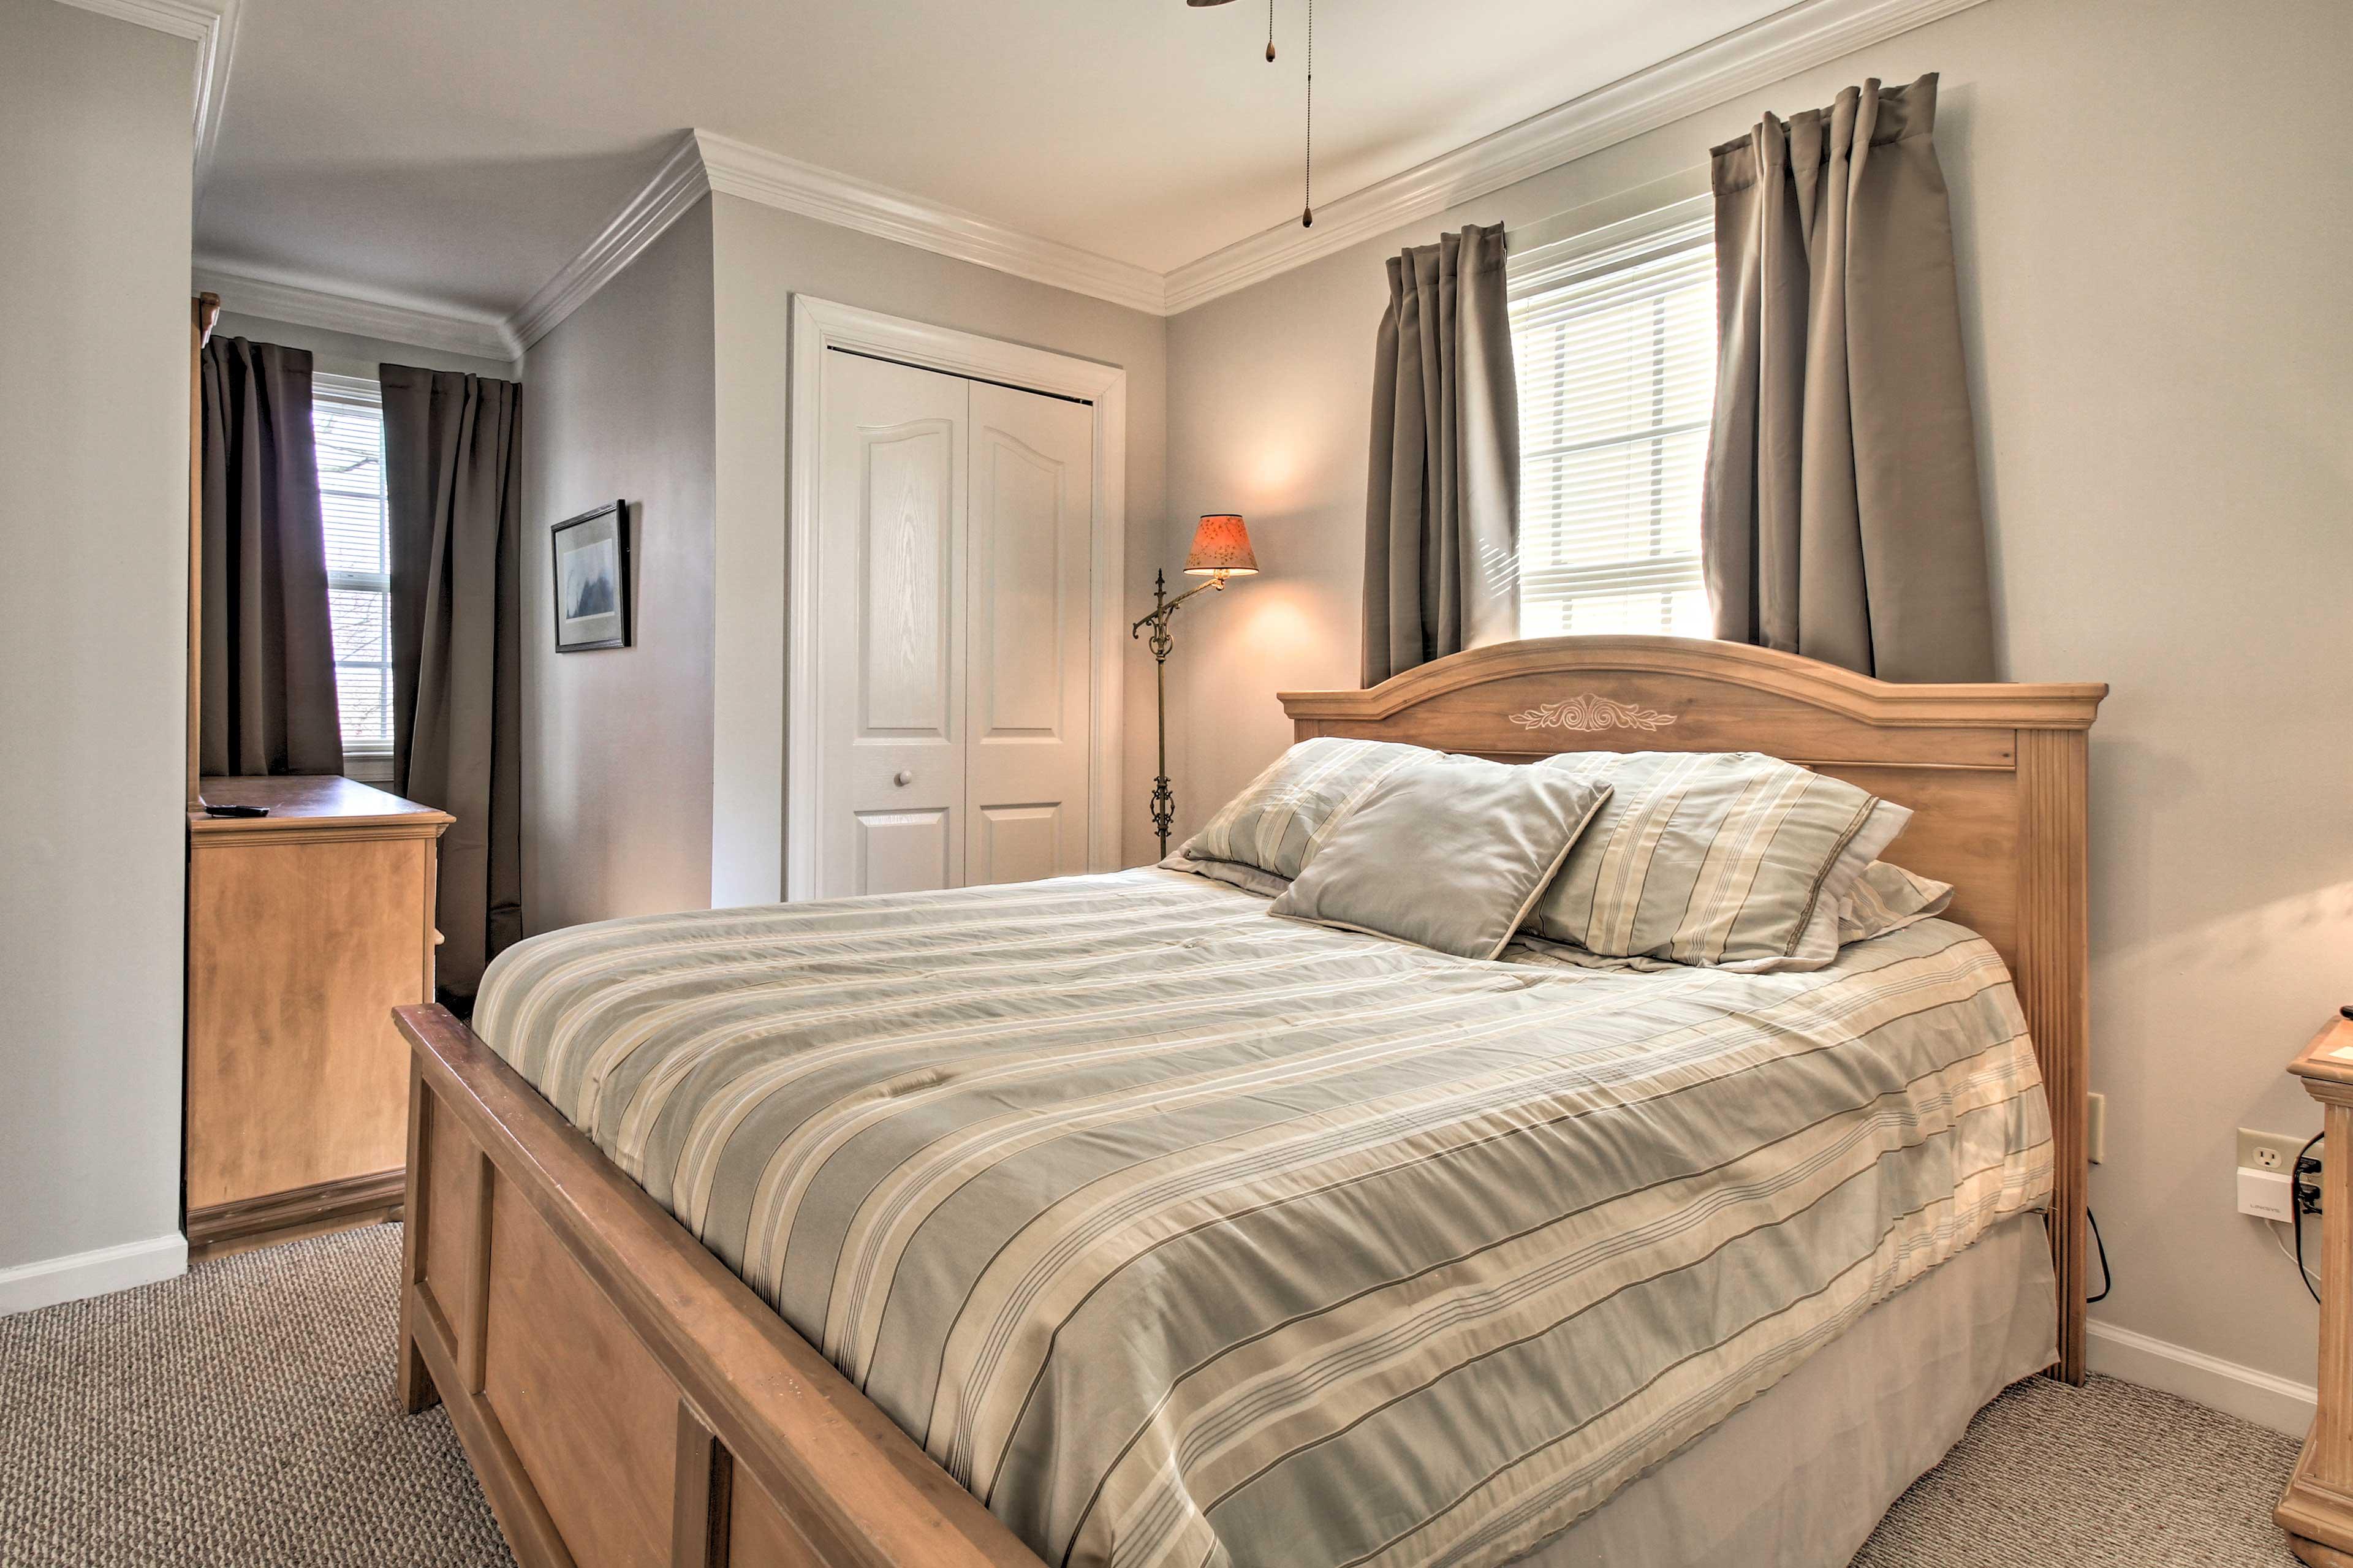 The master bedroom features a Sleep Number queen mattress!